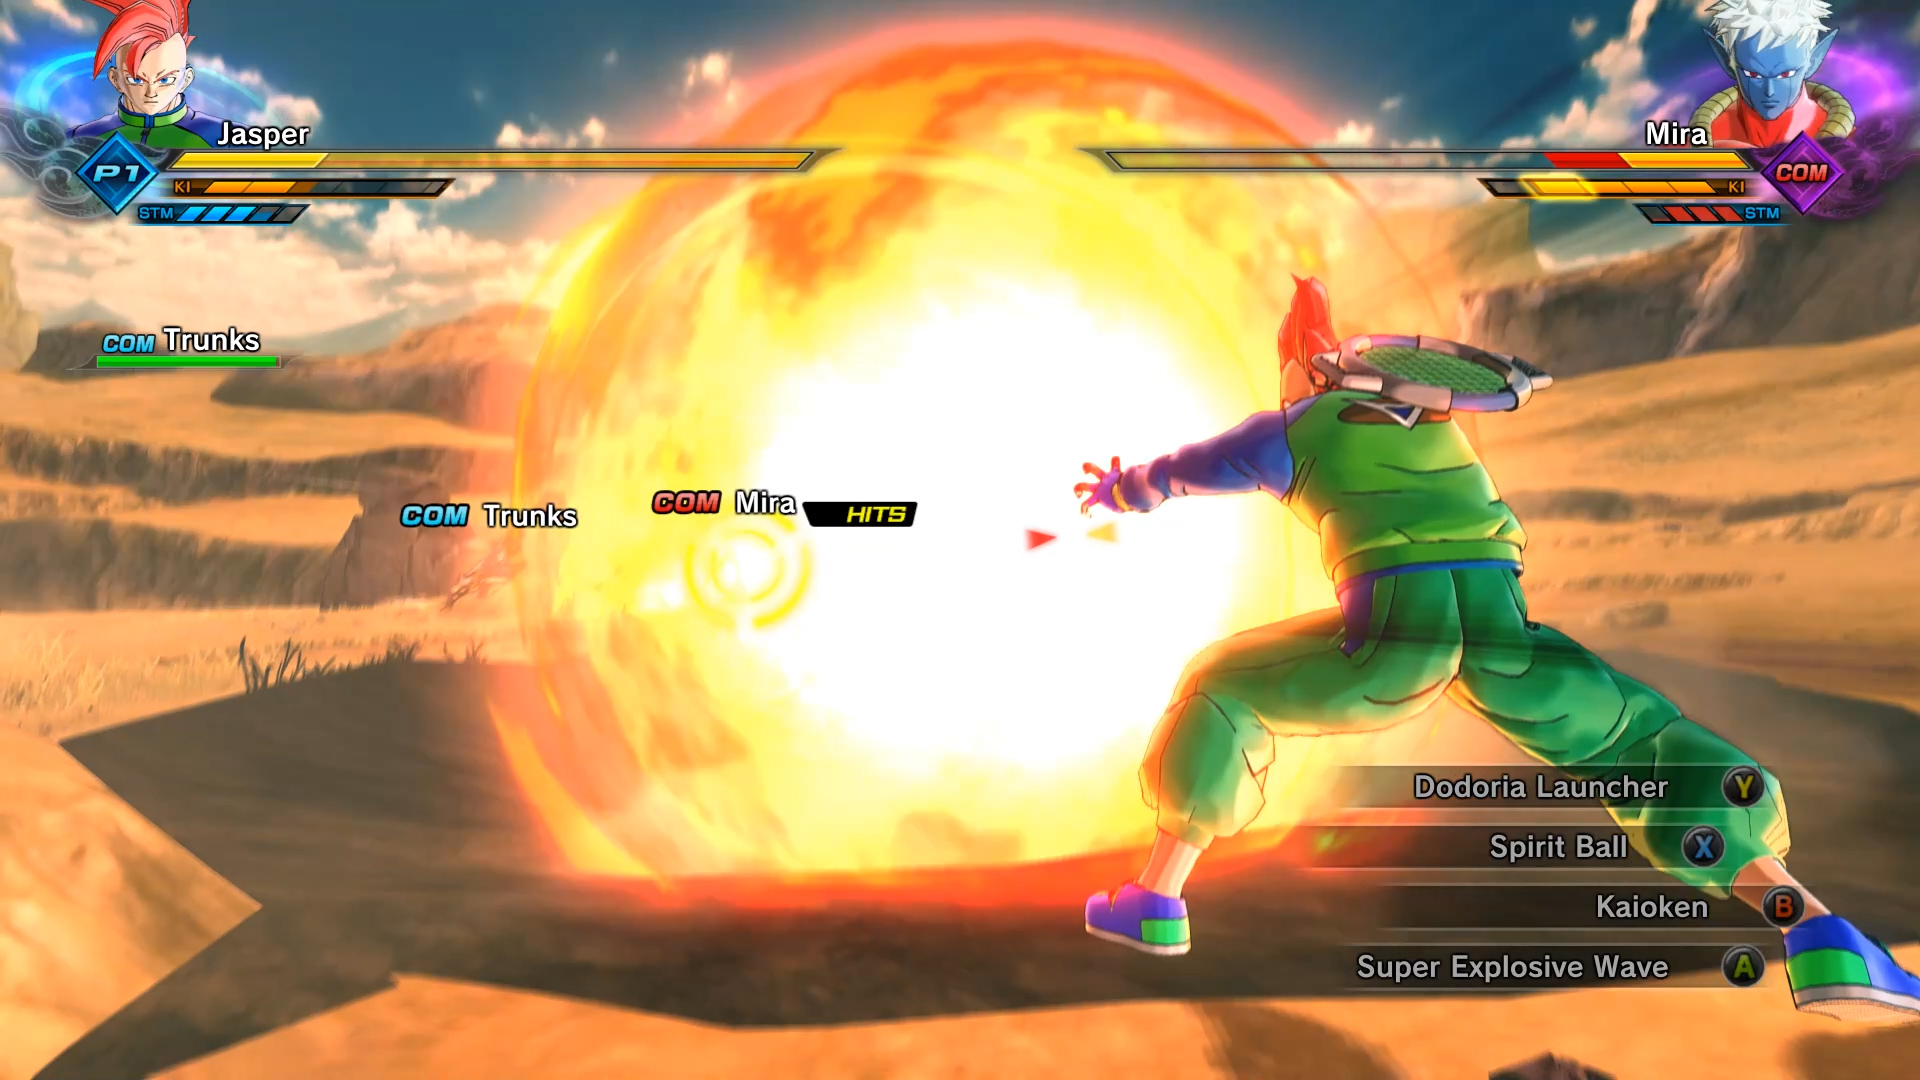 Co-Optimus - Review - Dragon Ball Xenoverse 2 Co-Op Review